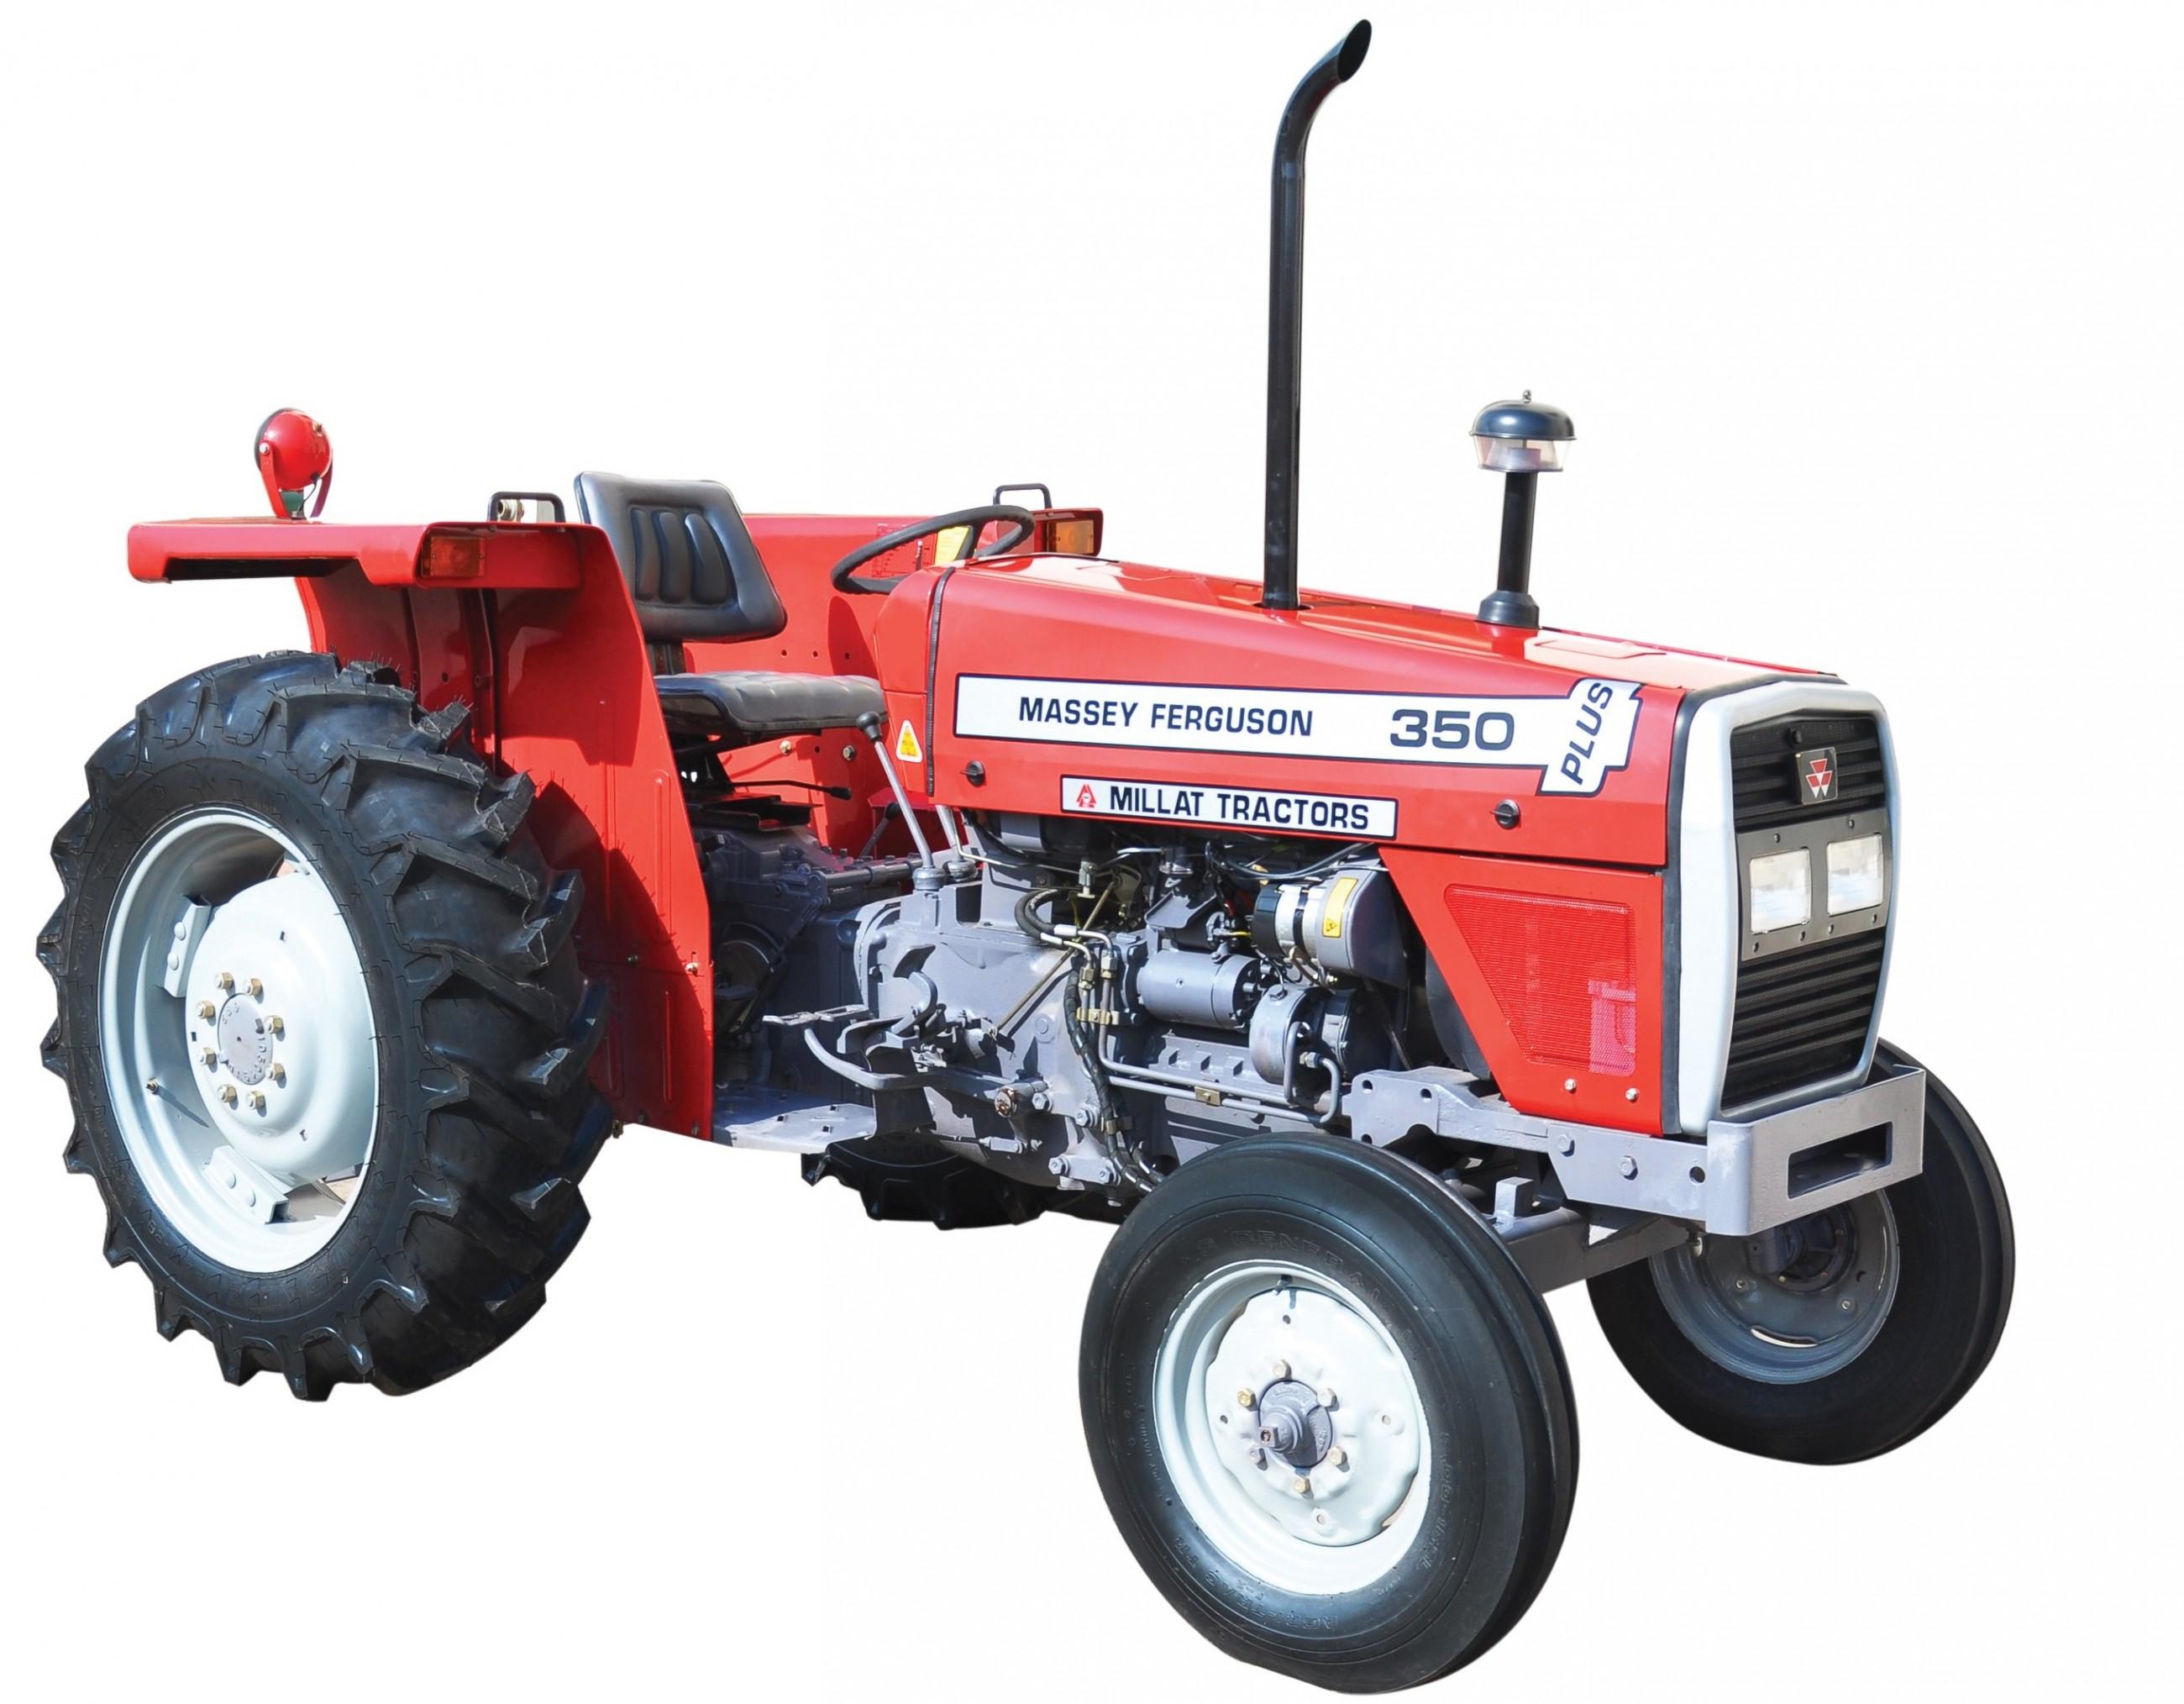 mf 350 plus tractor